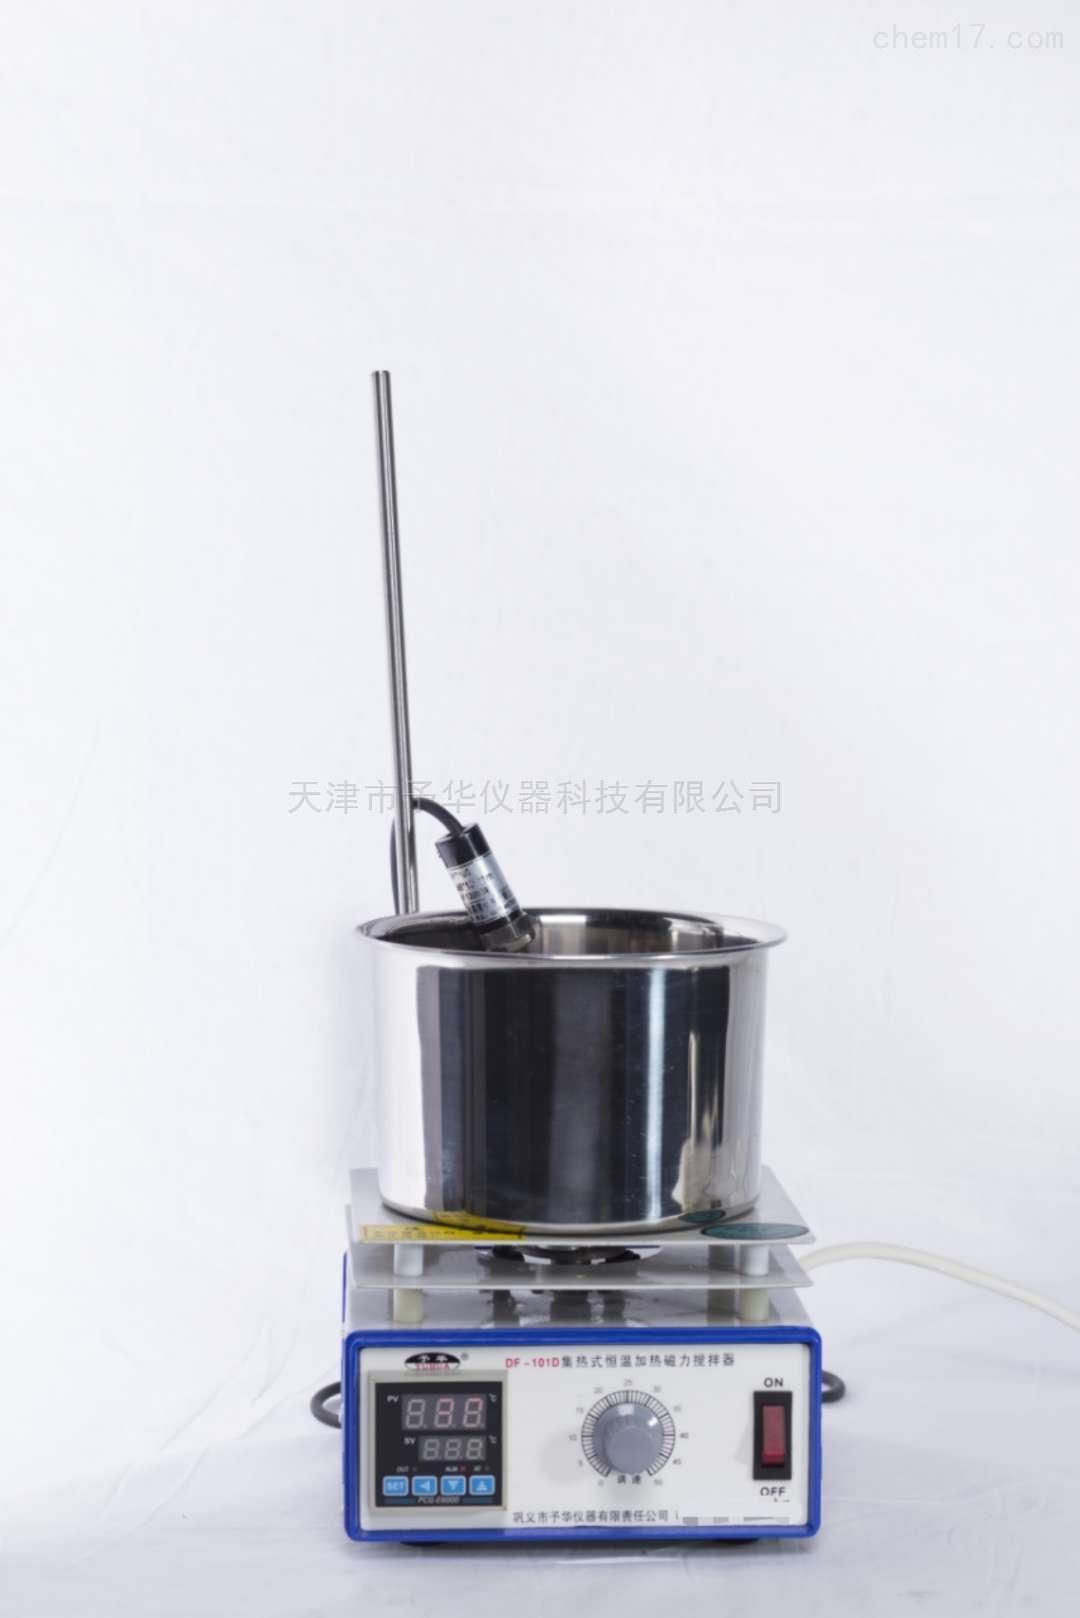 DF-101D小型集热式恒温加热磁力搅拌器